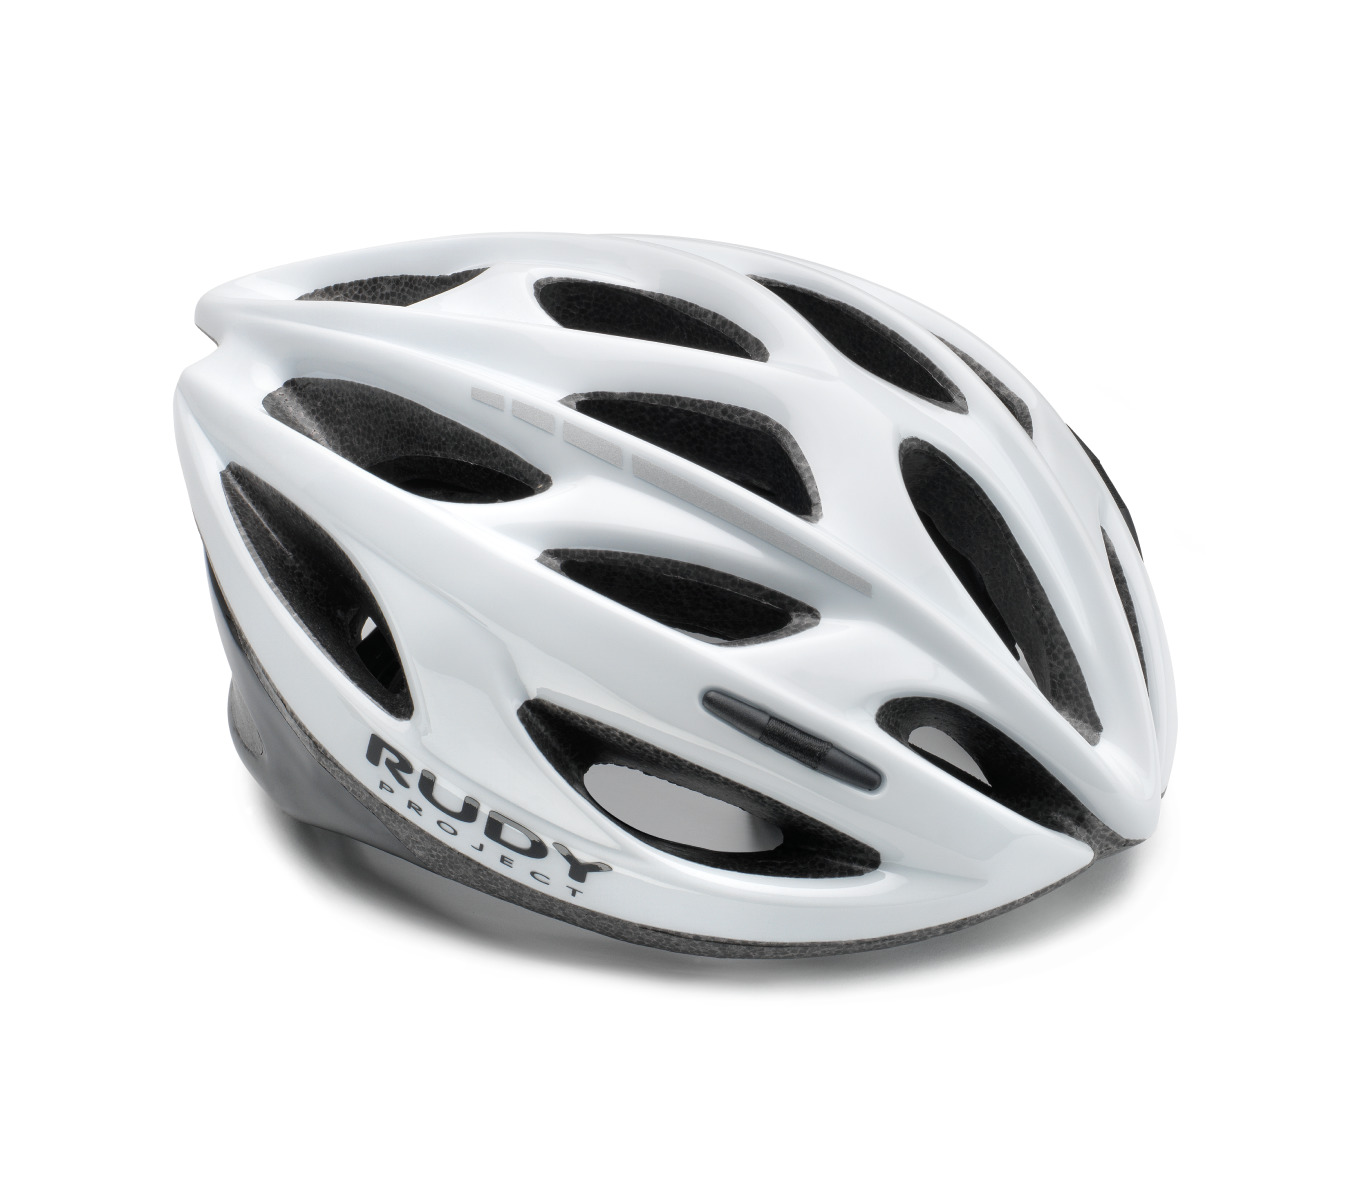 Rudy Project Zumy - Cykelhjelm - Shiny Hvid | Helmets